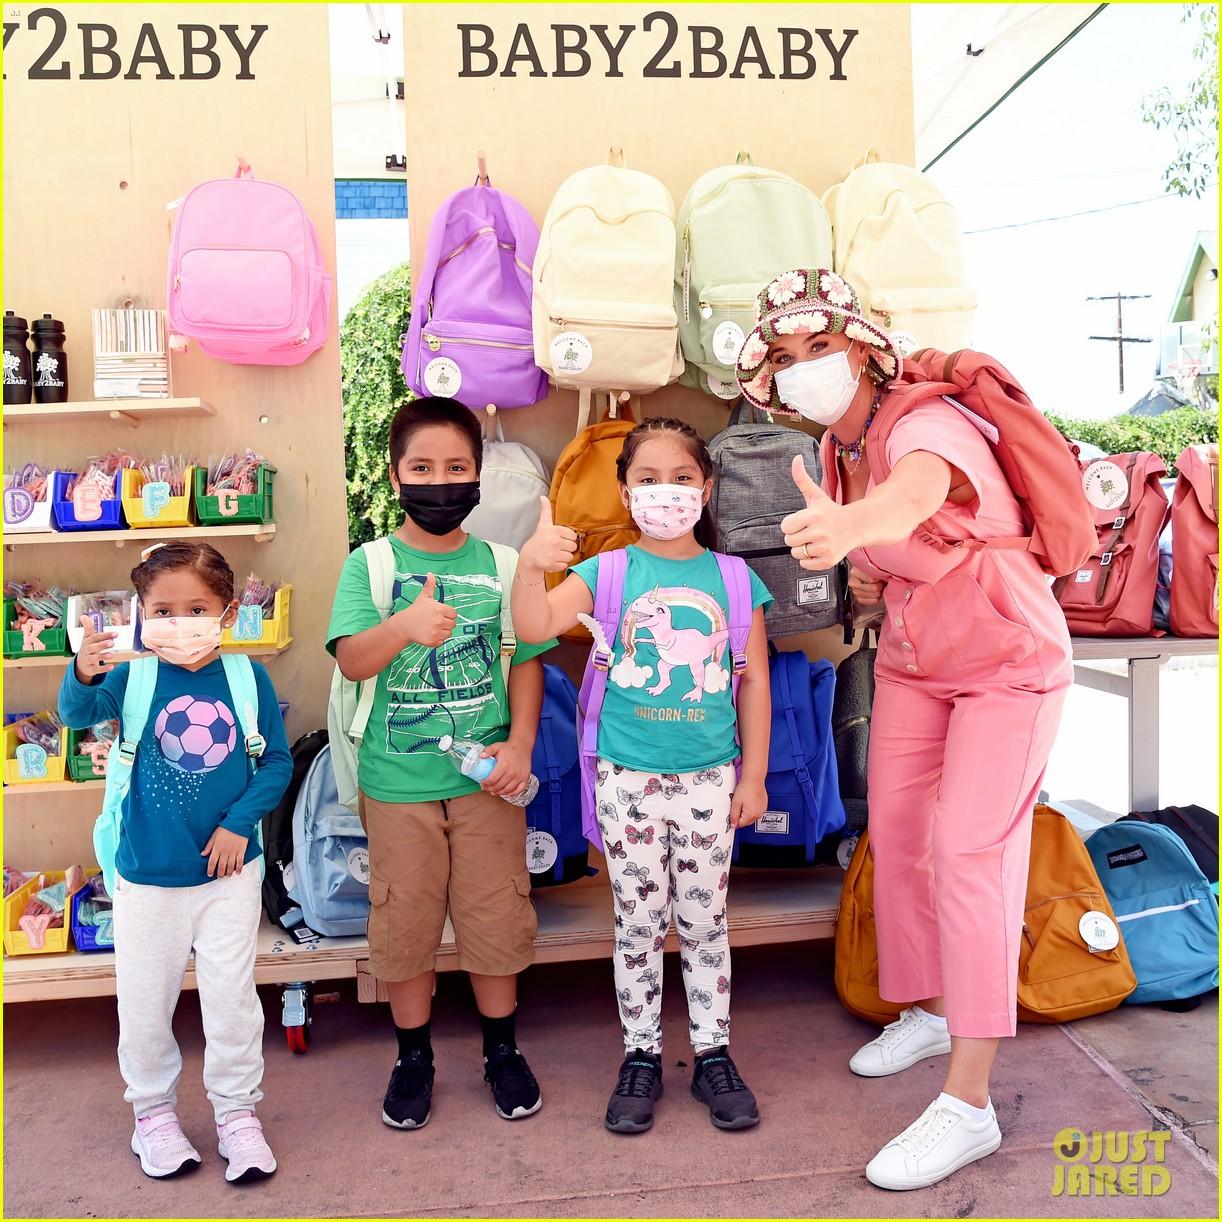 katy perry zooey deschanel nicole richie baby2baby event 214593099